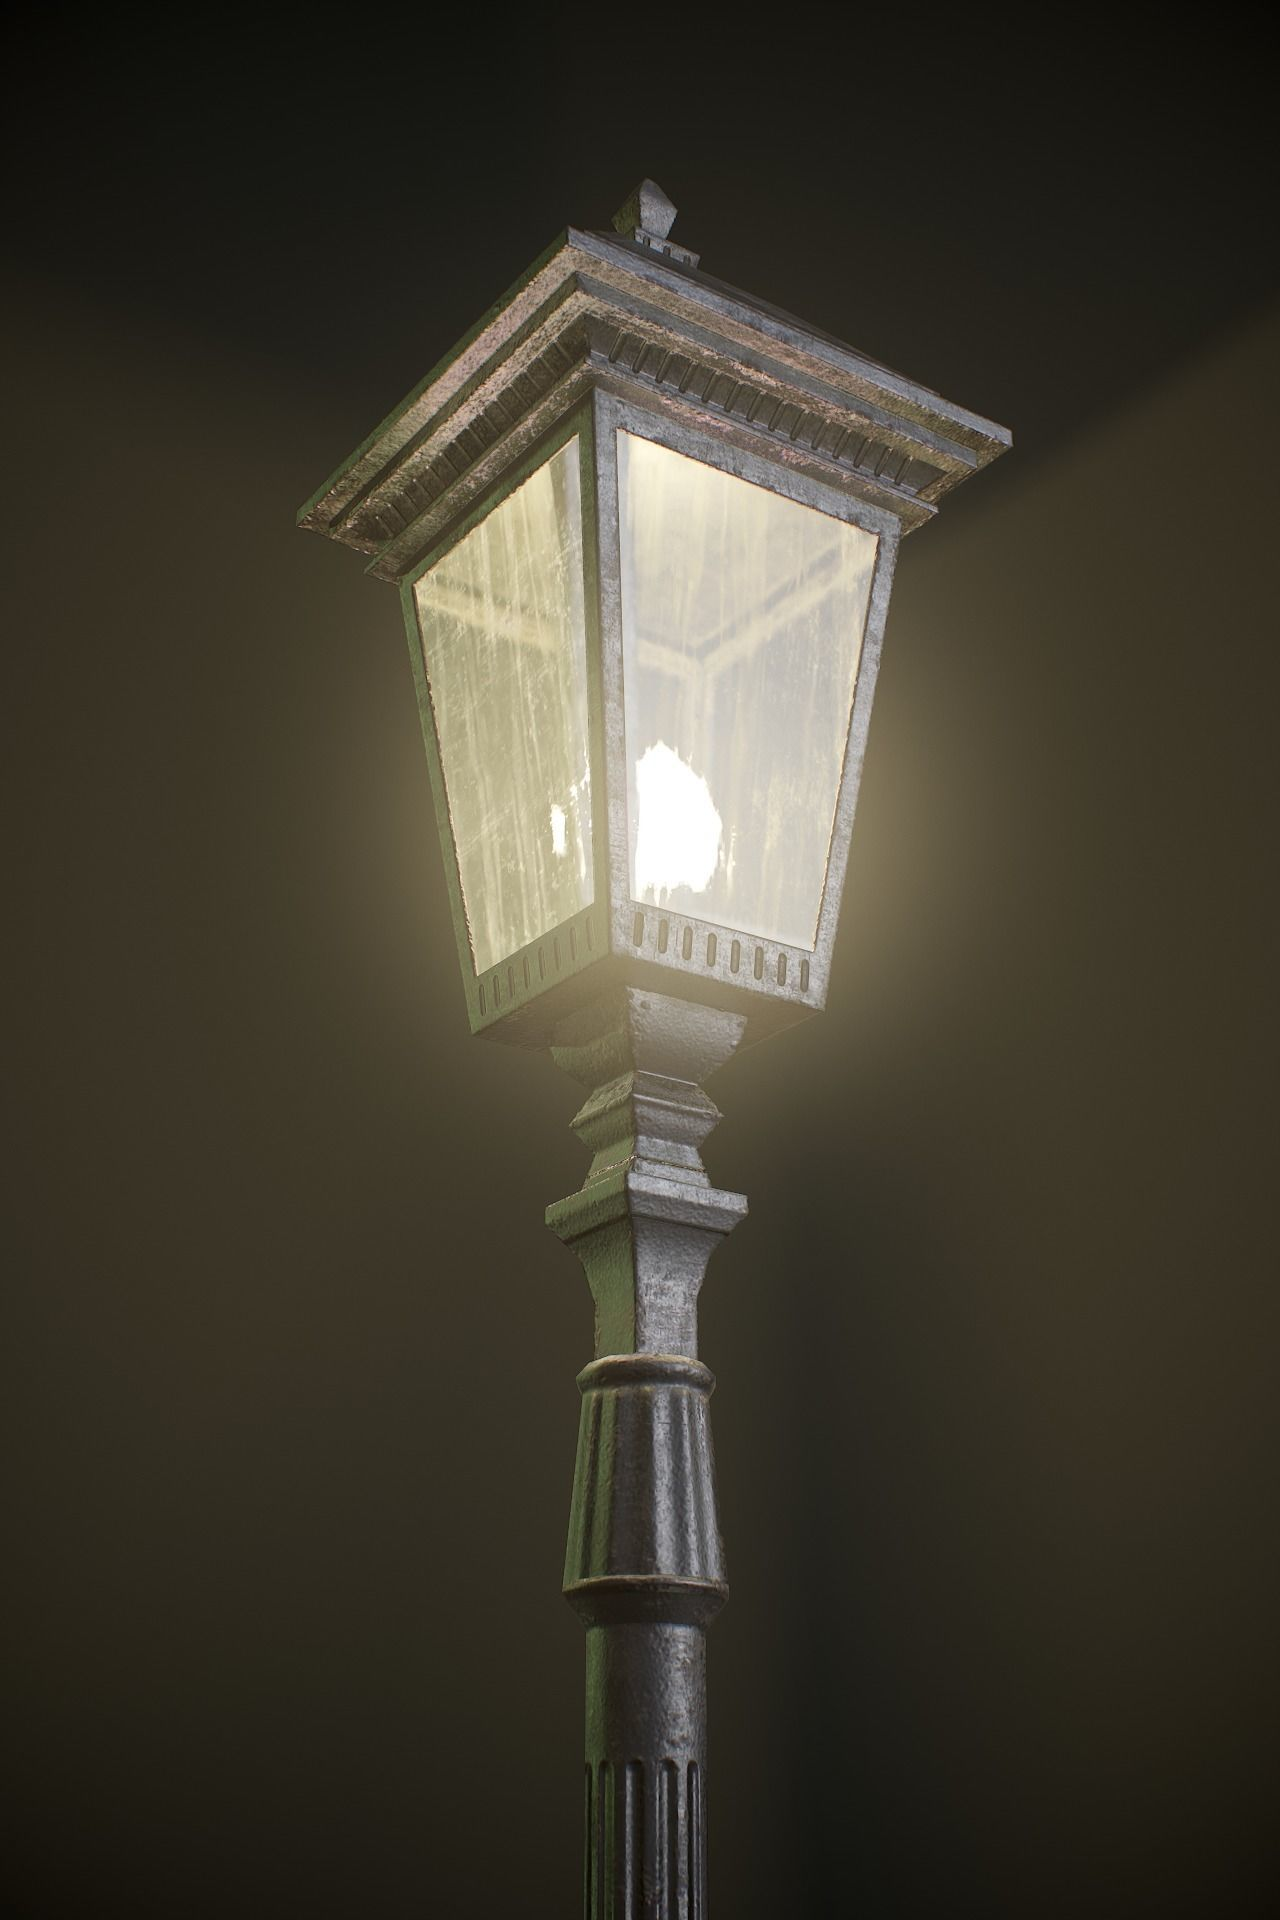 PBR Street Lamp